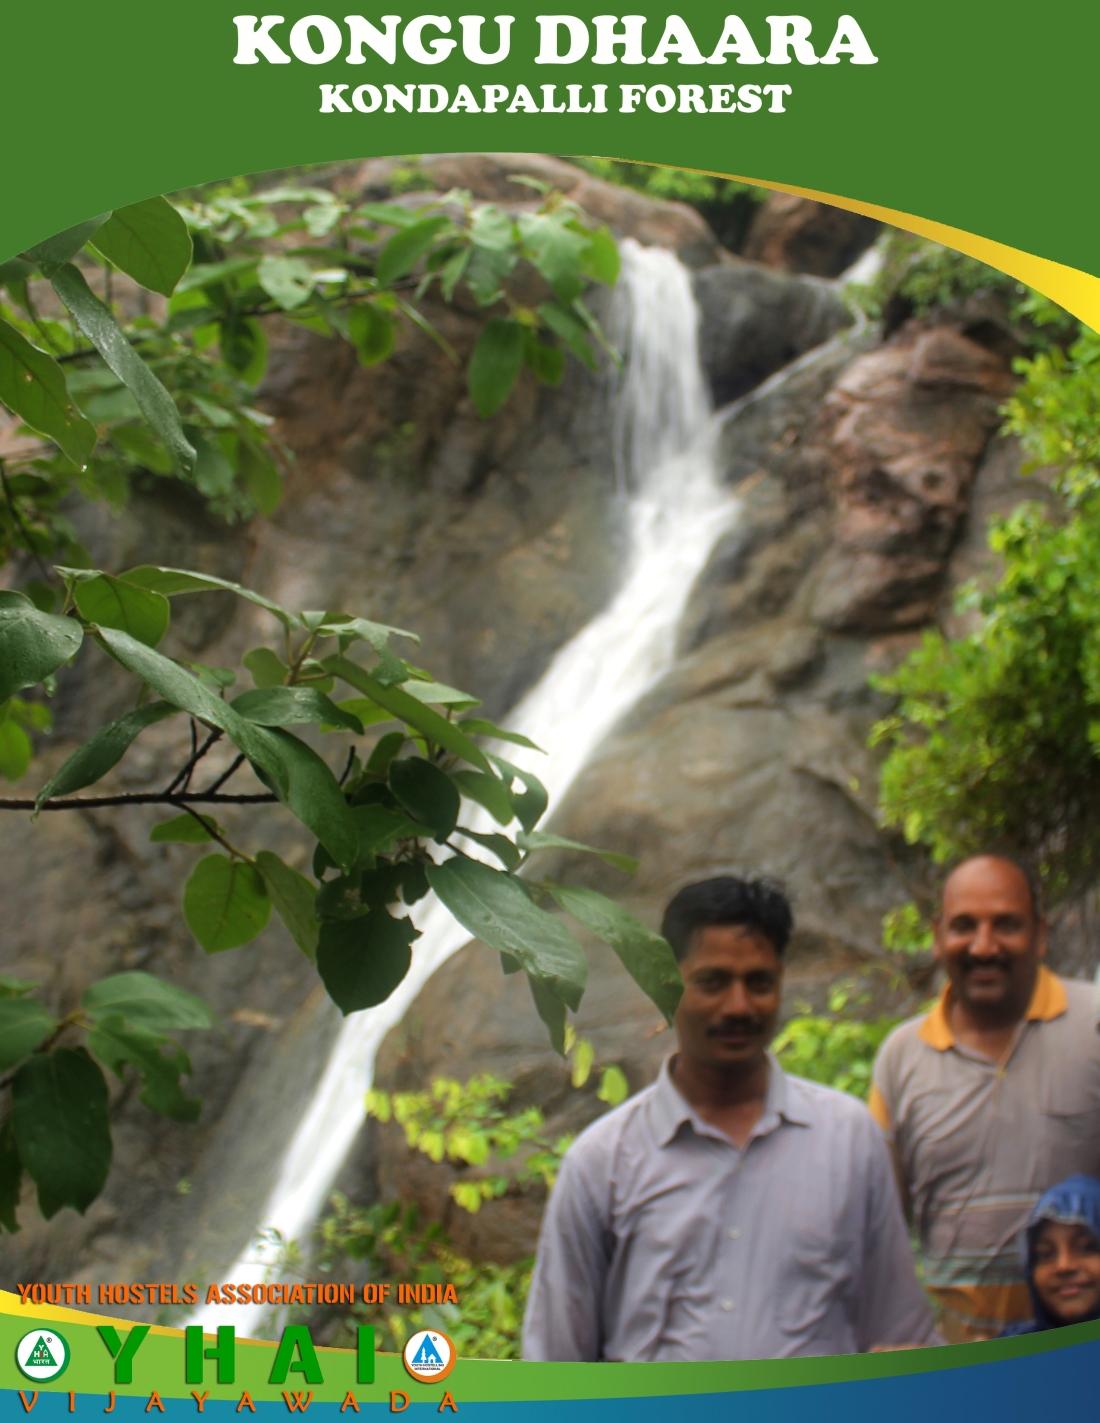 Kongu Dhaara - Kondapalli Forest